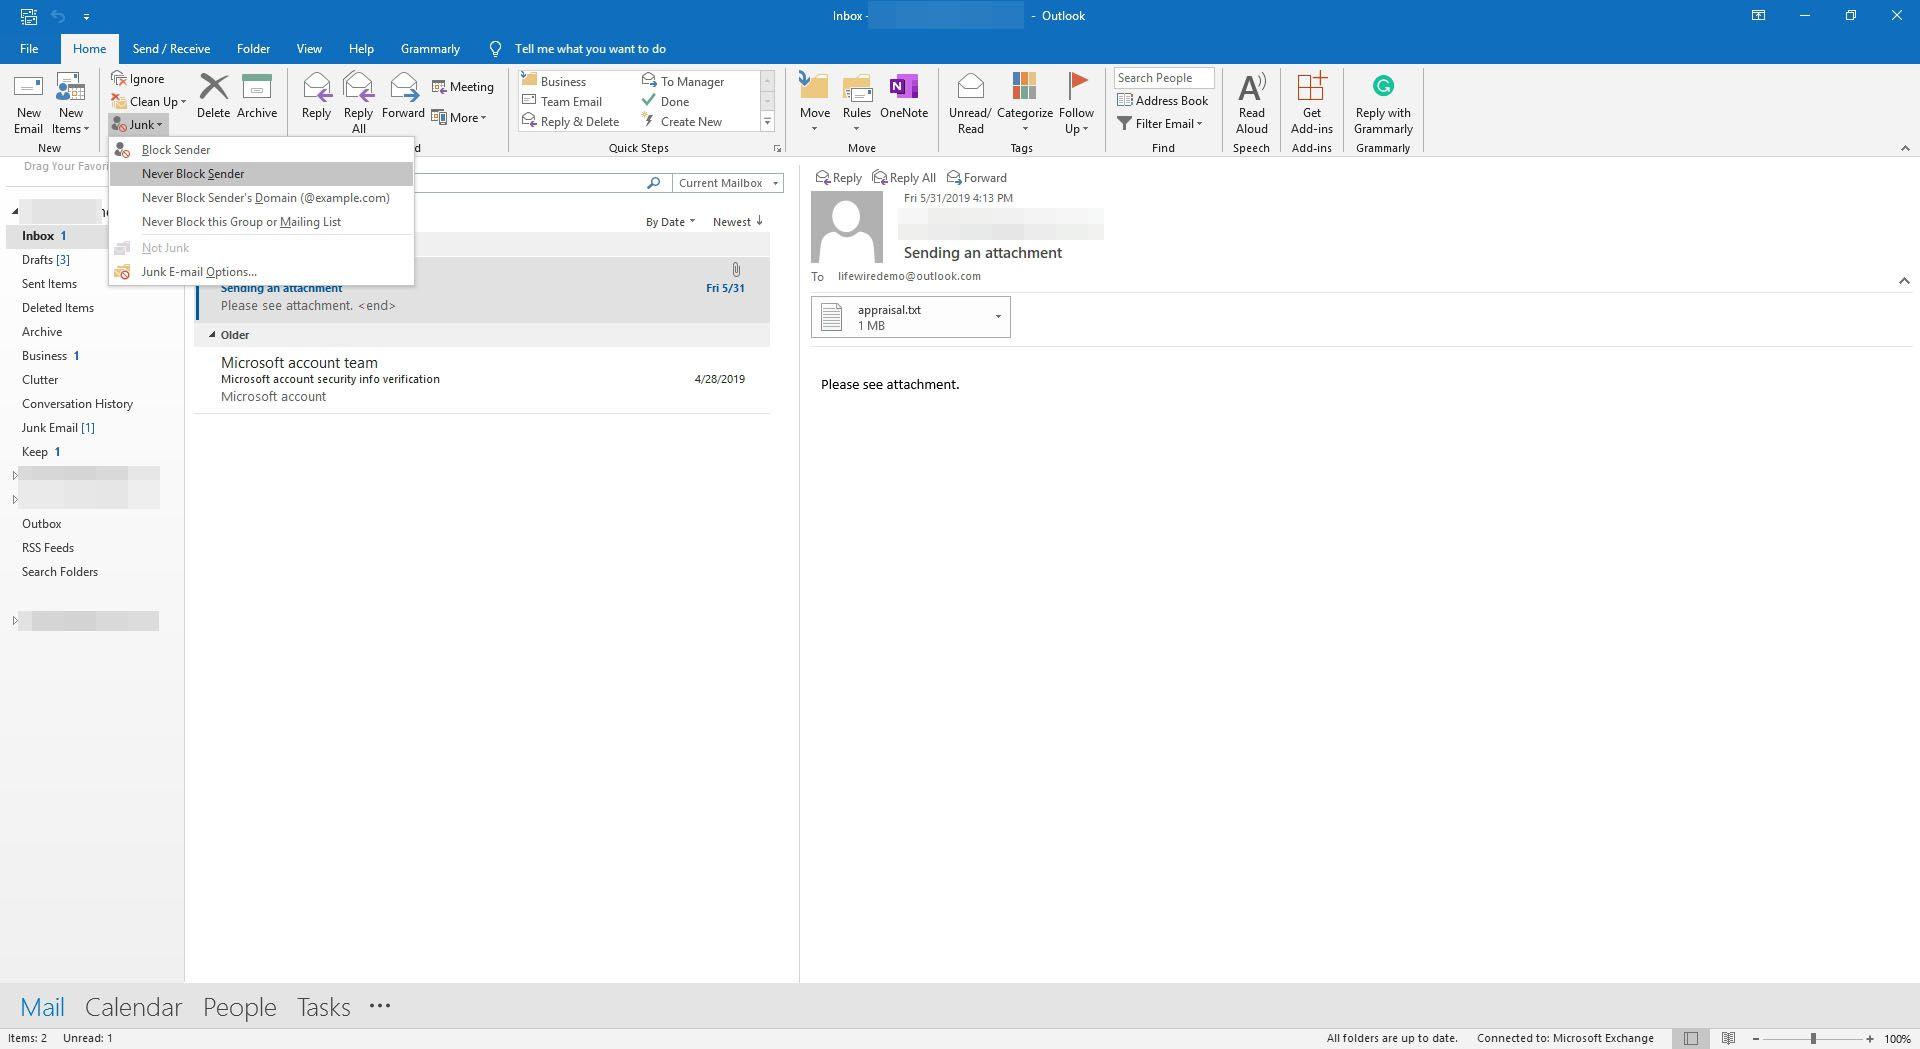 Selecting to never block sender in Outlook.